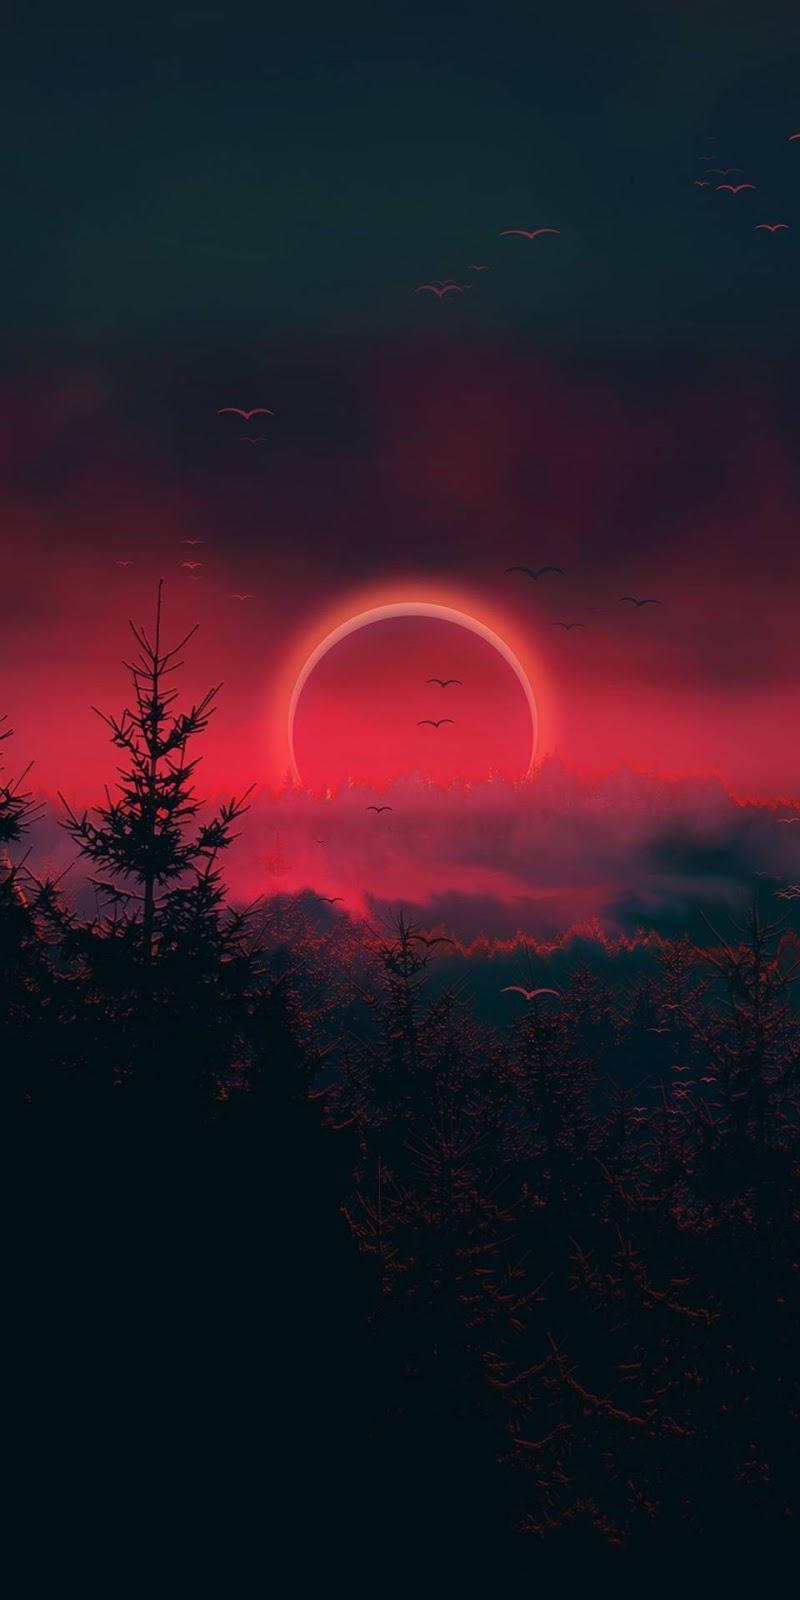 Eclipse sky